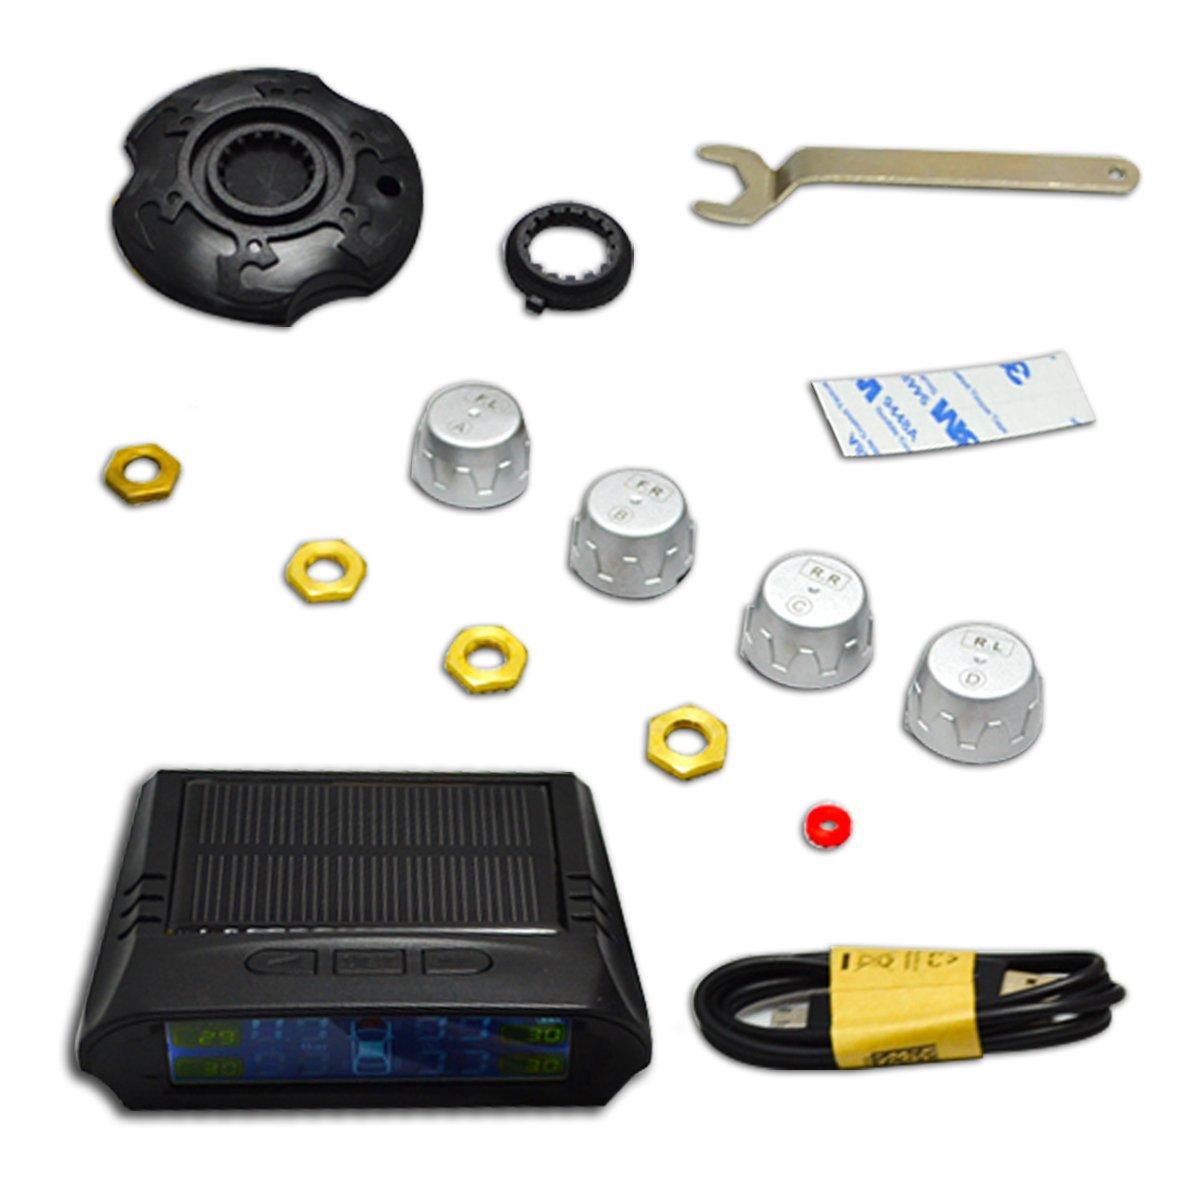 Meipro TPMS,Solar Power Reifendruck Kontrollsystem,Digital Wireless LCD Display Reifendruck-Monitor-System mit 4 externen Sensoren f/ür Home Car